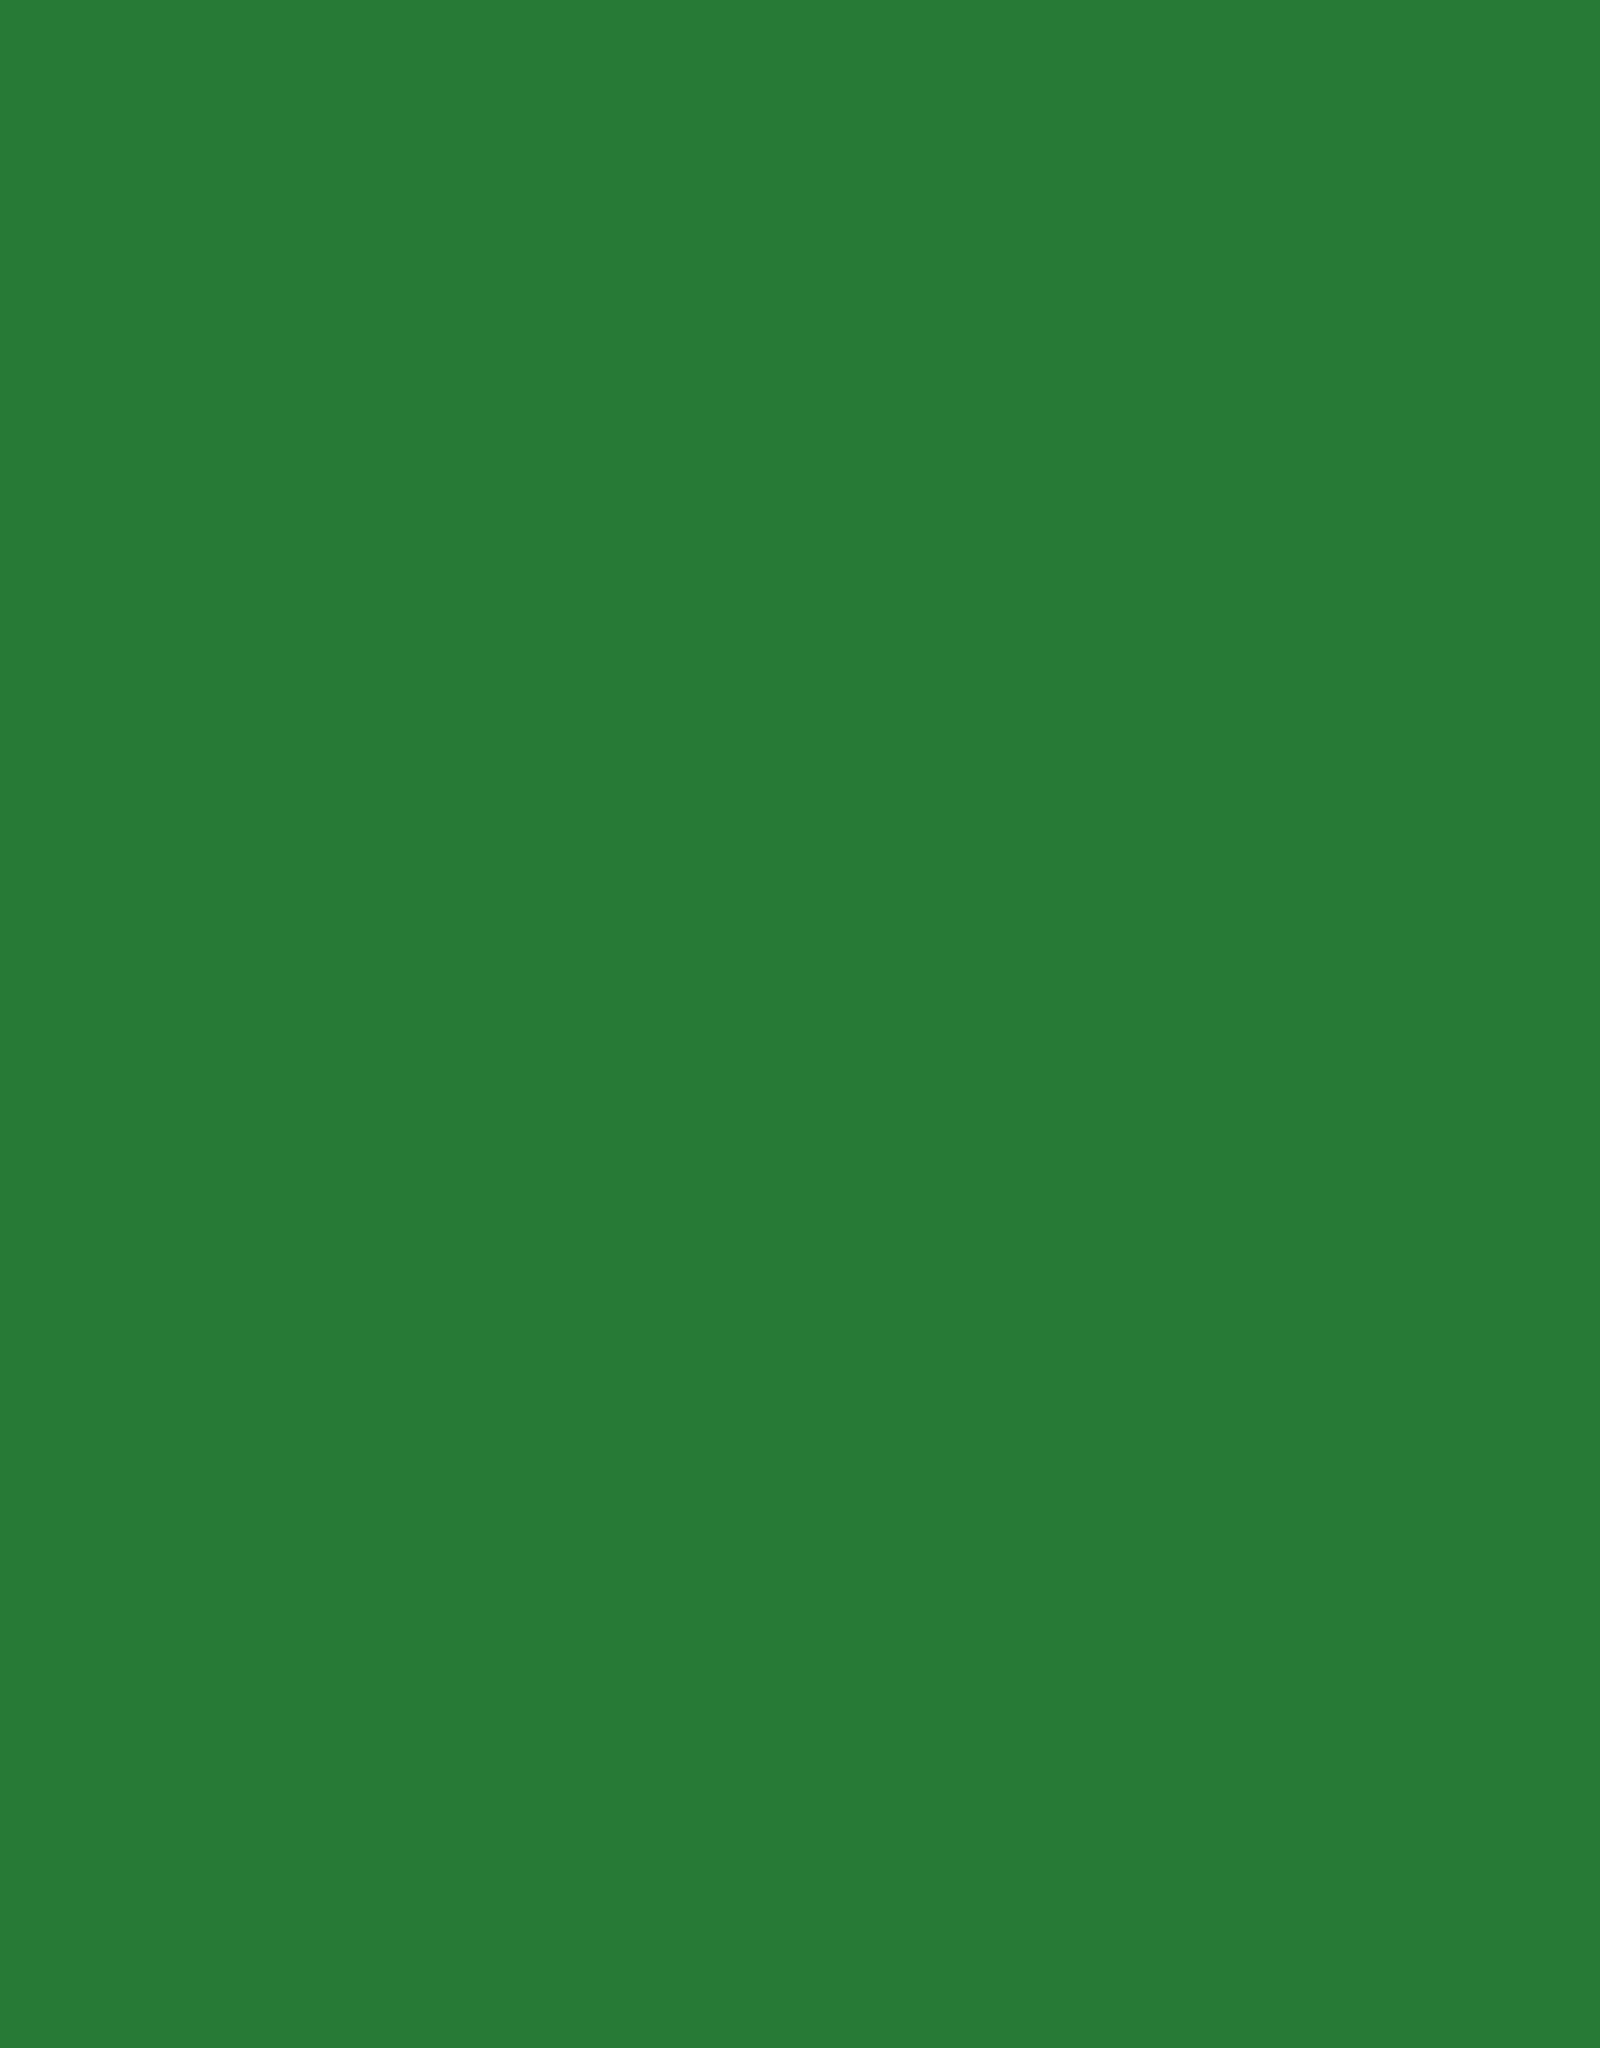 Trapsuutjies Weidegroen Large